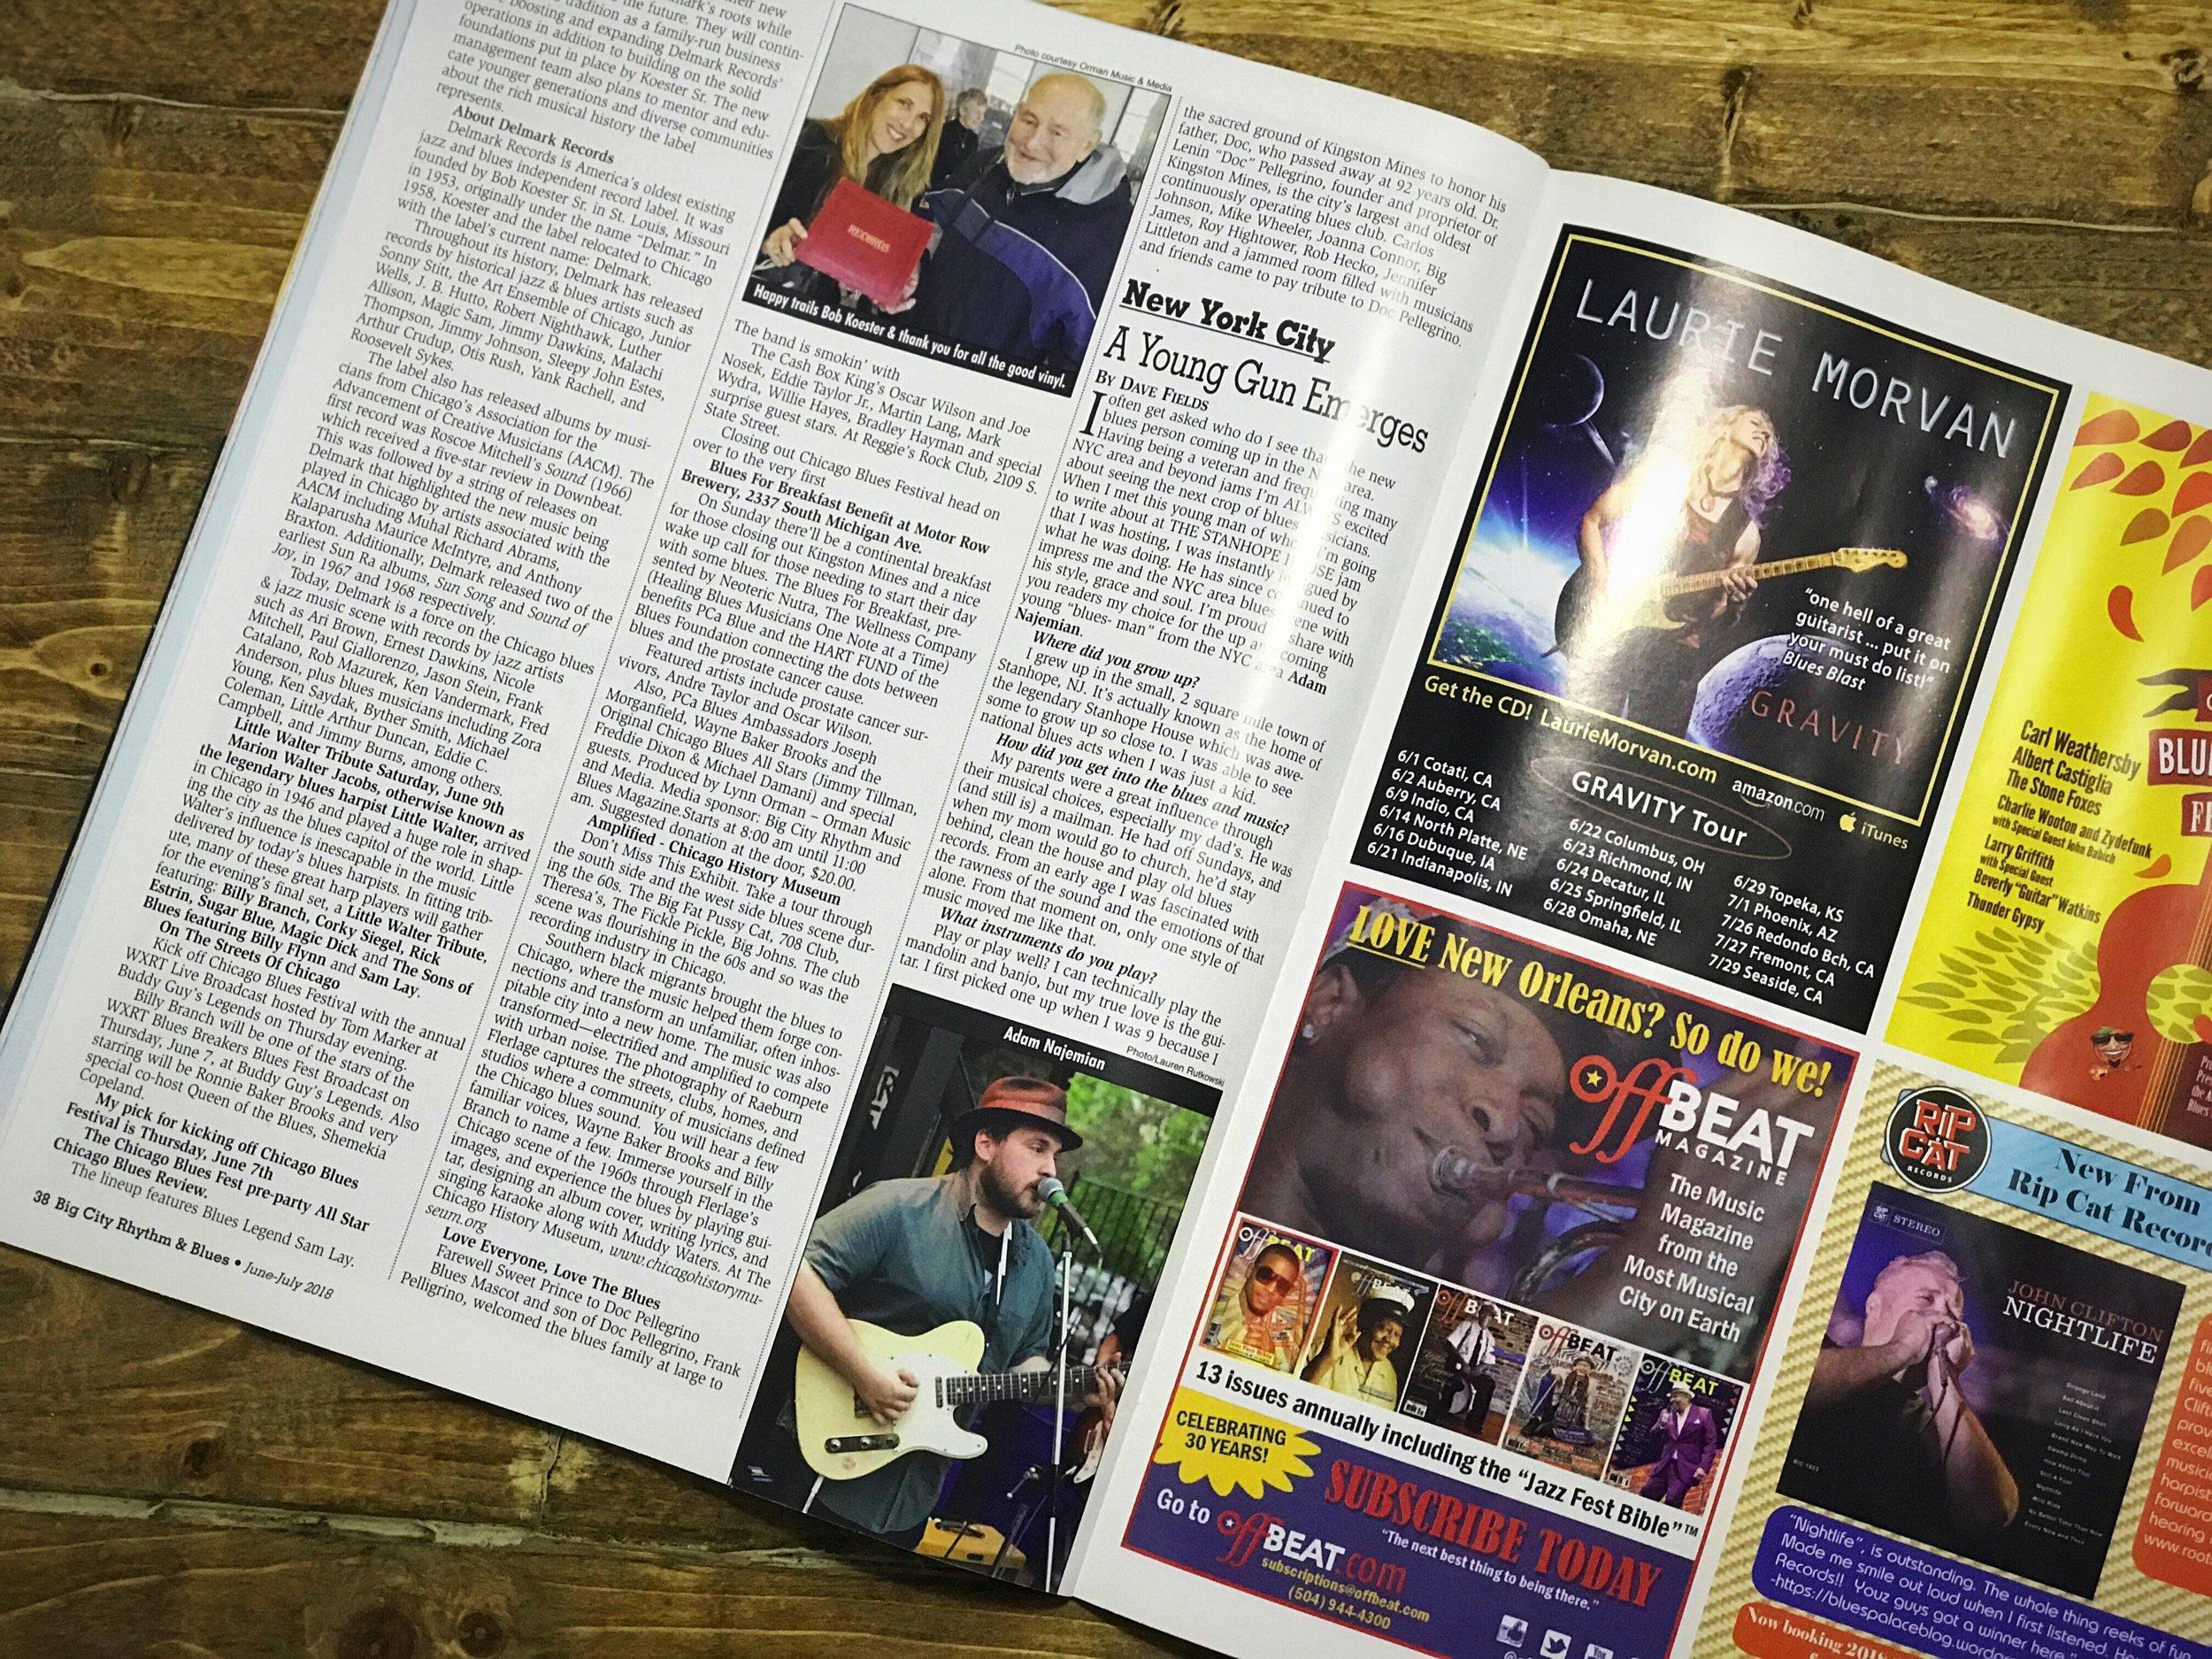 big city rhythm blues magazine adam najemian